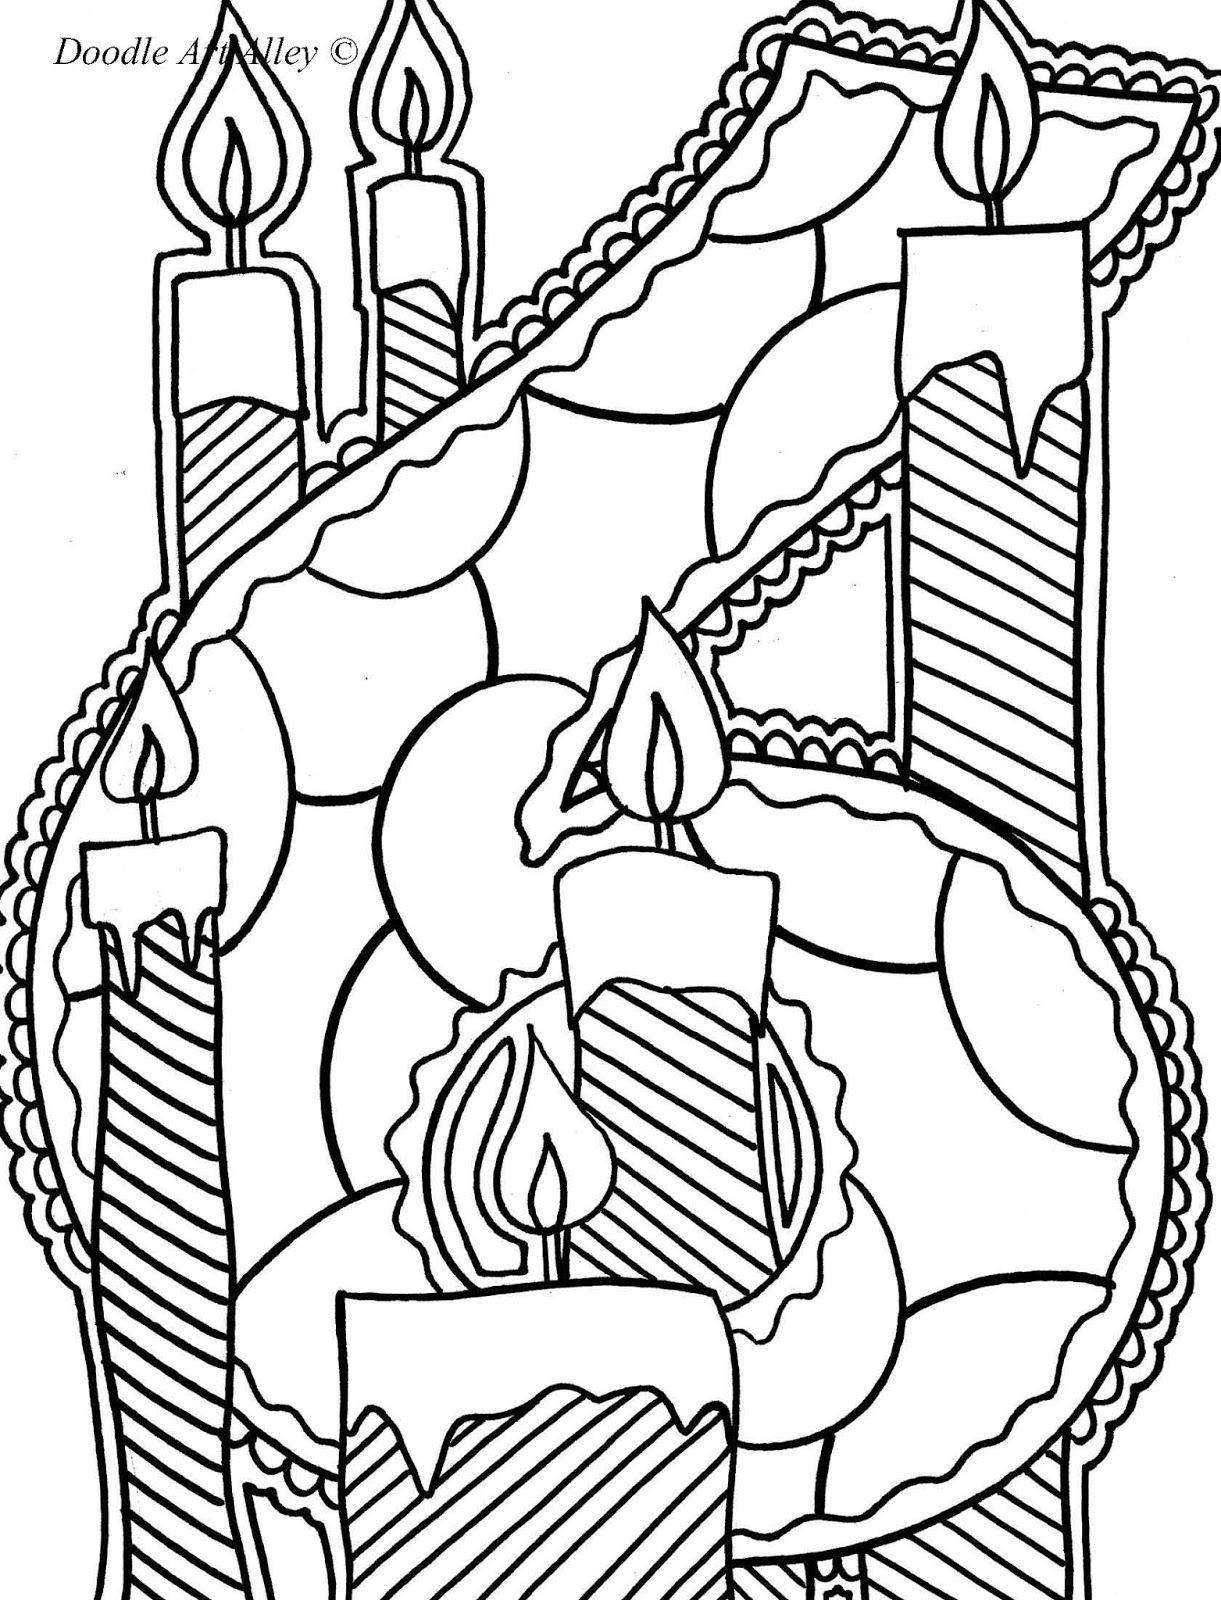 Http X2f X2f Www Doodle Art Alley Com X2f Sitesinden Alinti Boyama Sayfalari Sanat Dersleri Kartlar